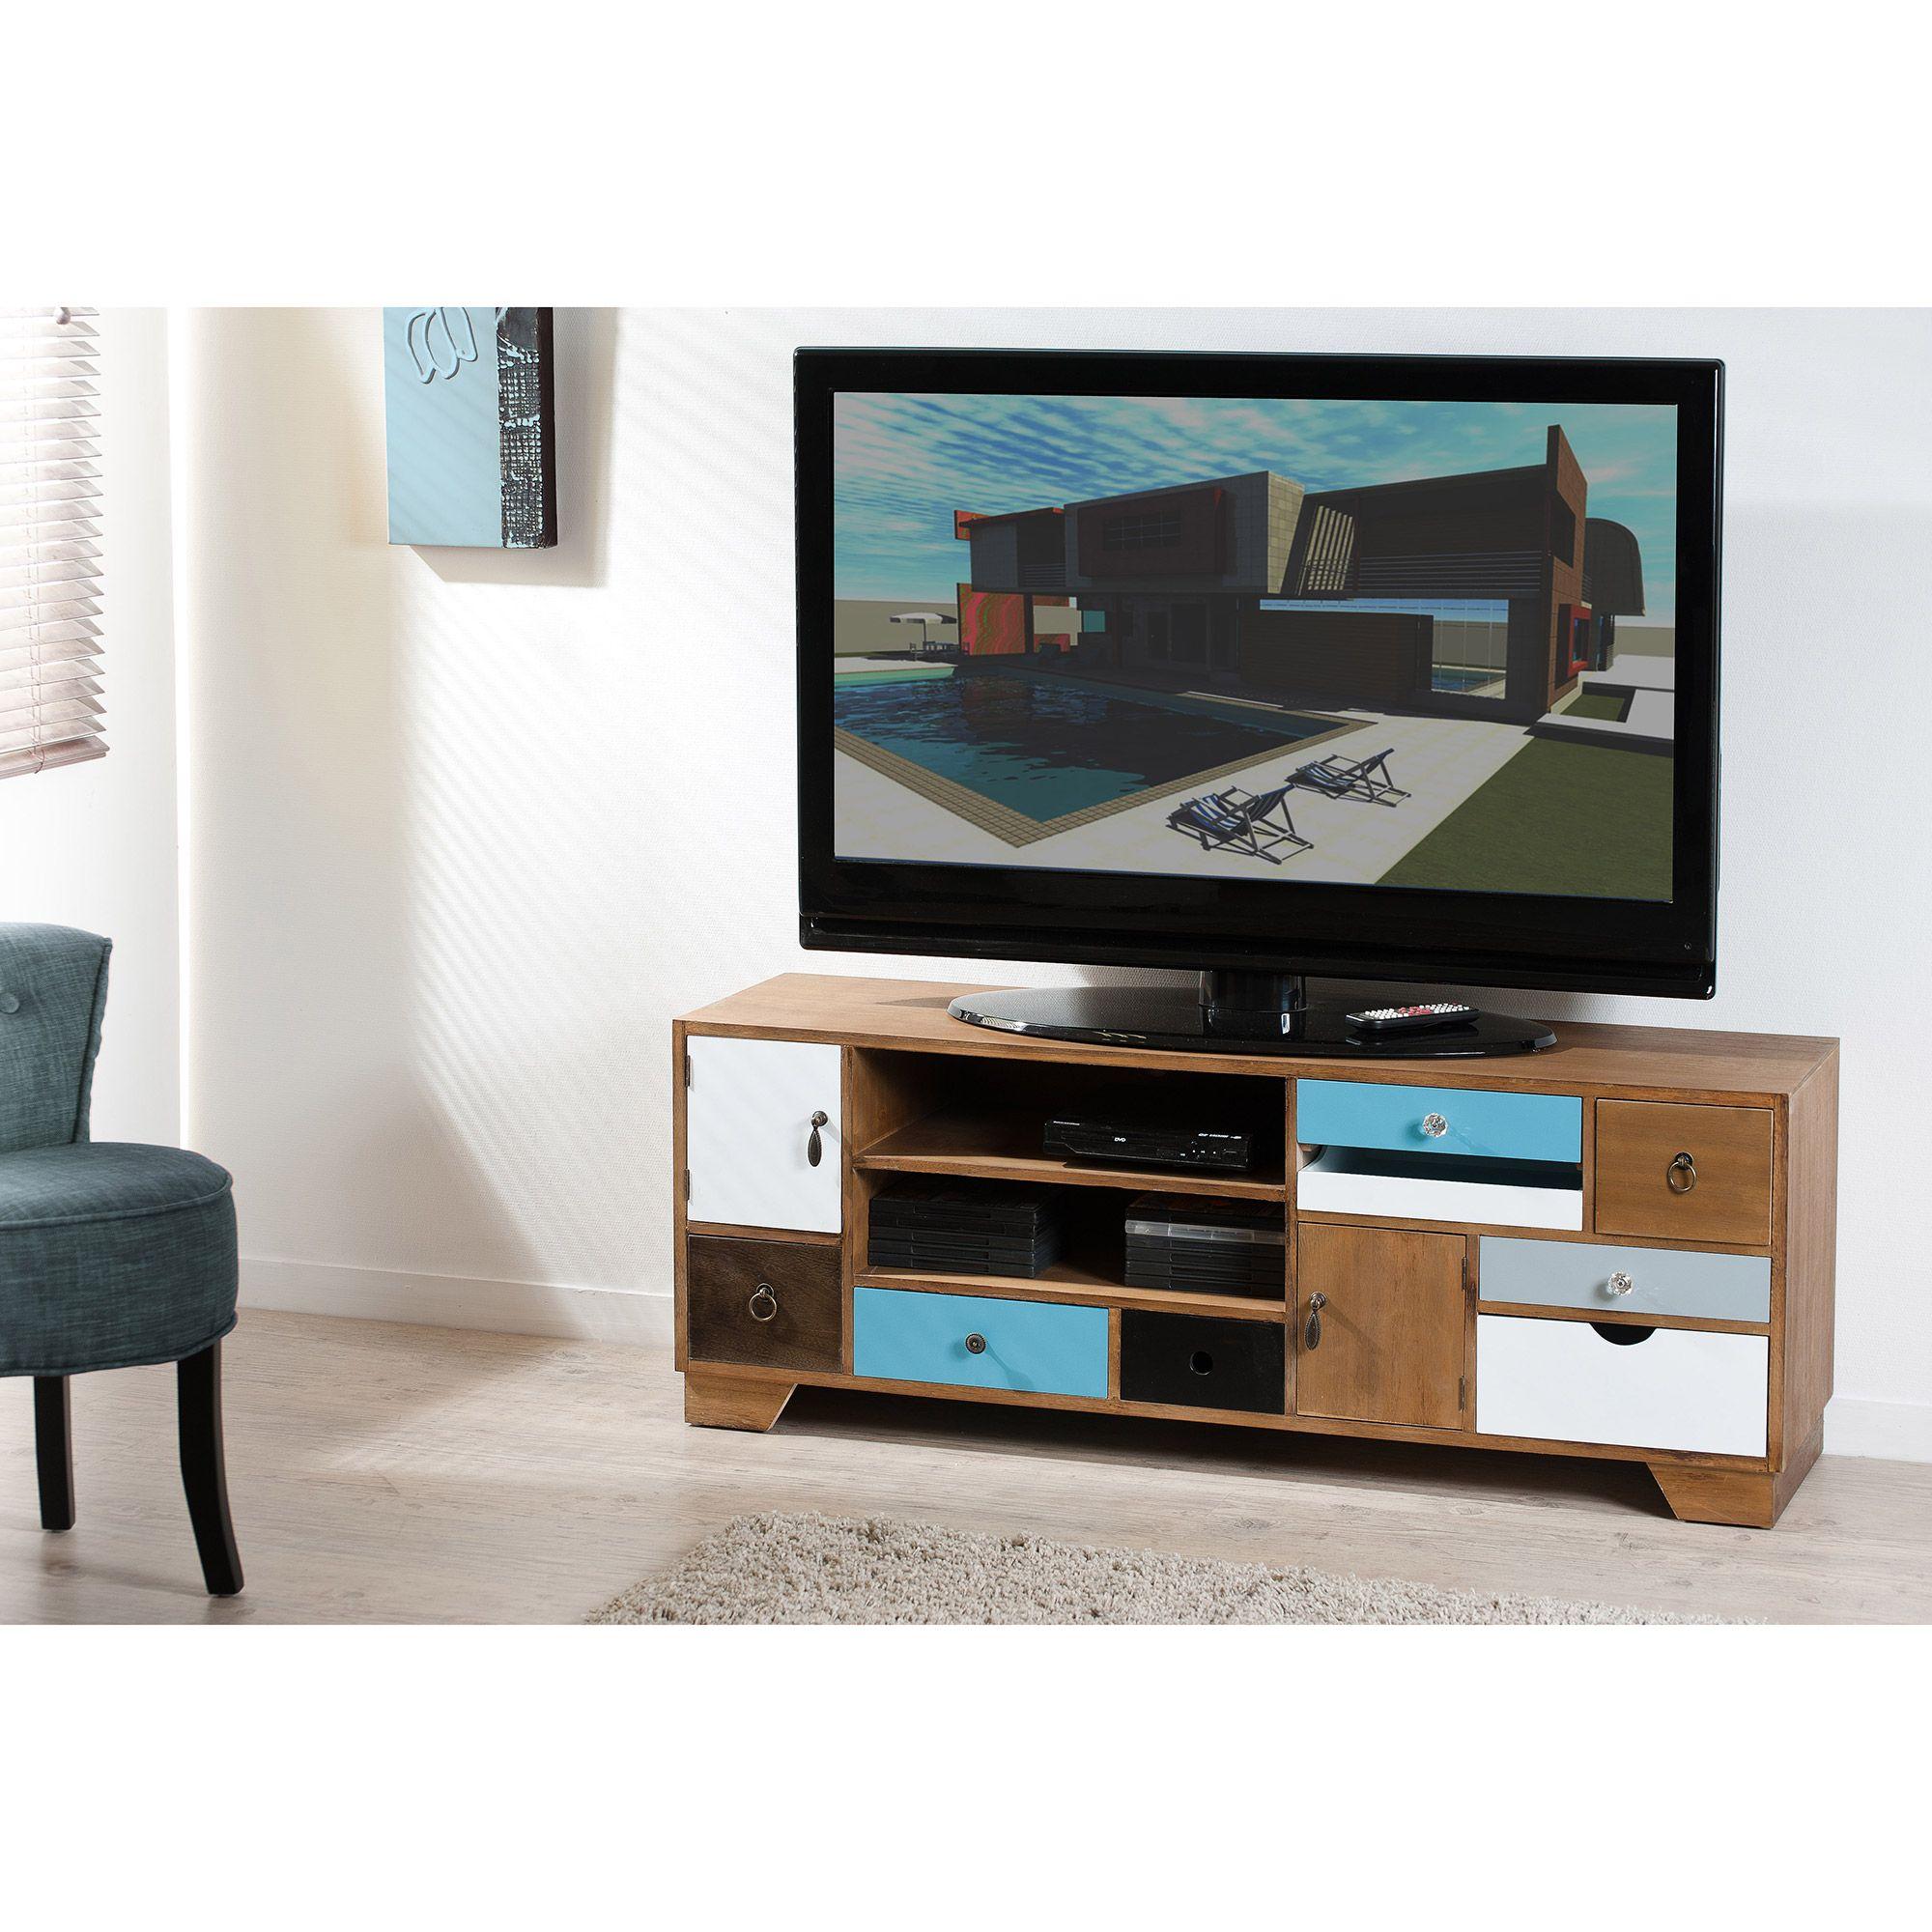 meuble tv bas multi rangements en bois l122cm marius port offert vintage scandinave. Black Bedroom Furniture Sets. Home Design Ideas